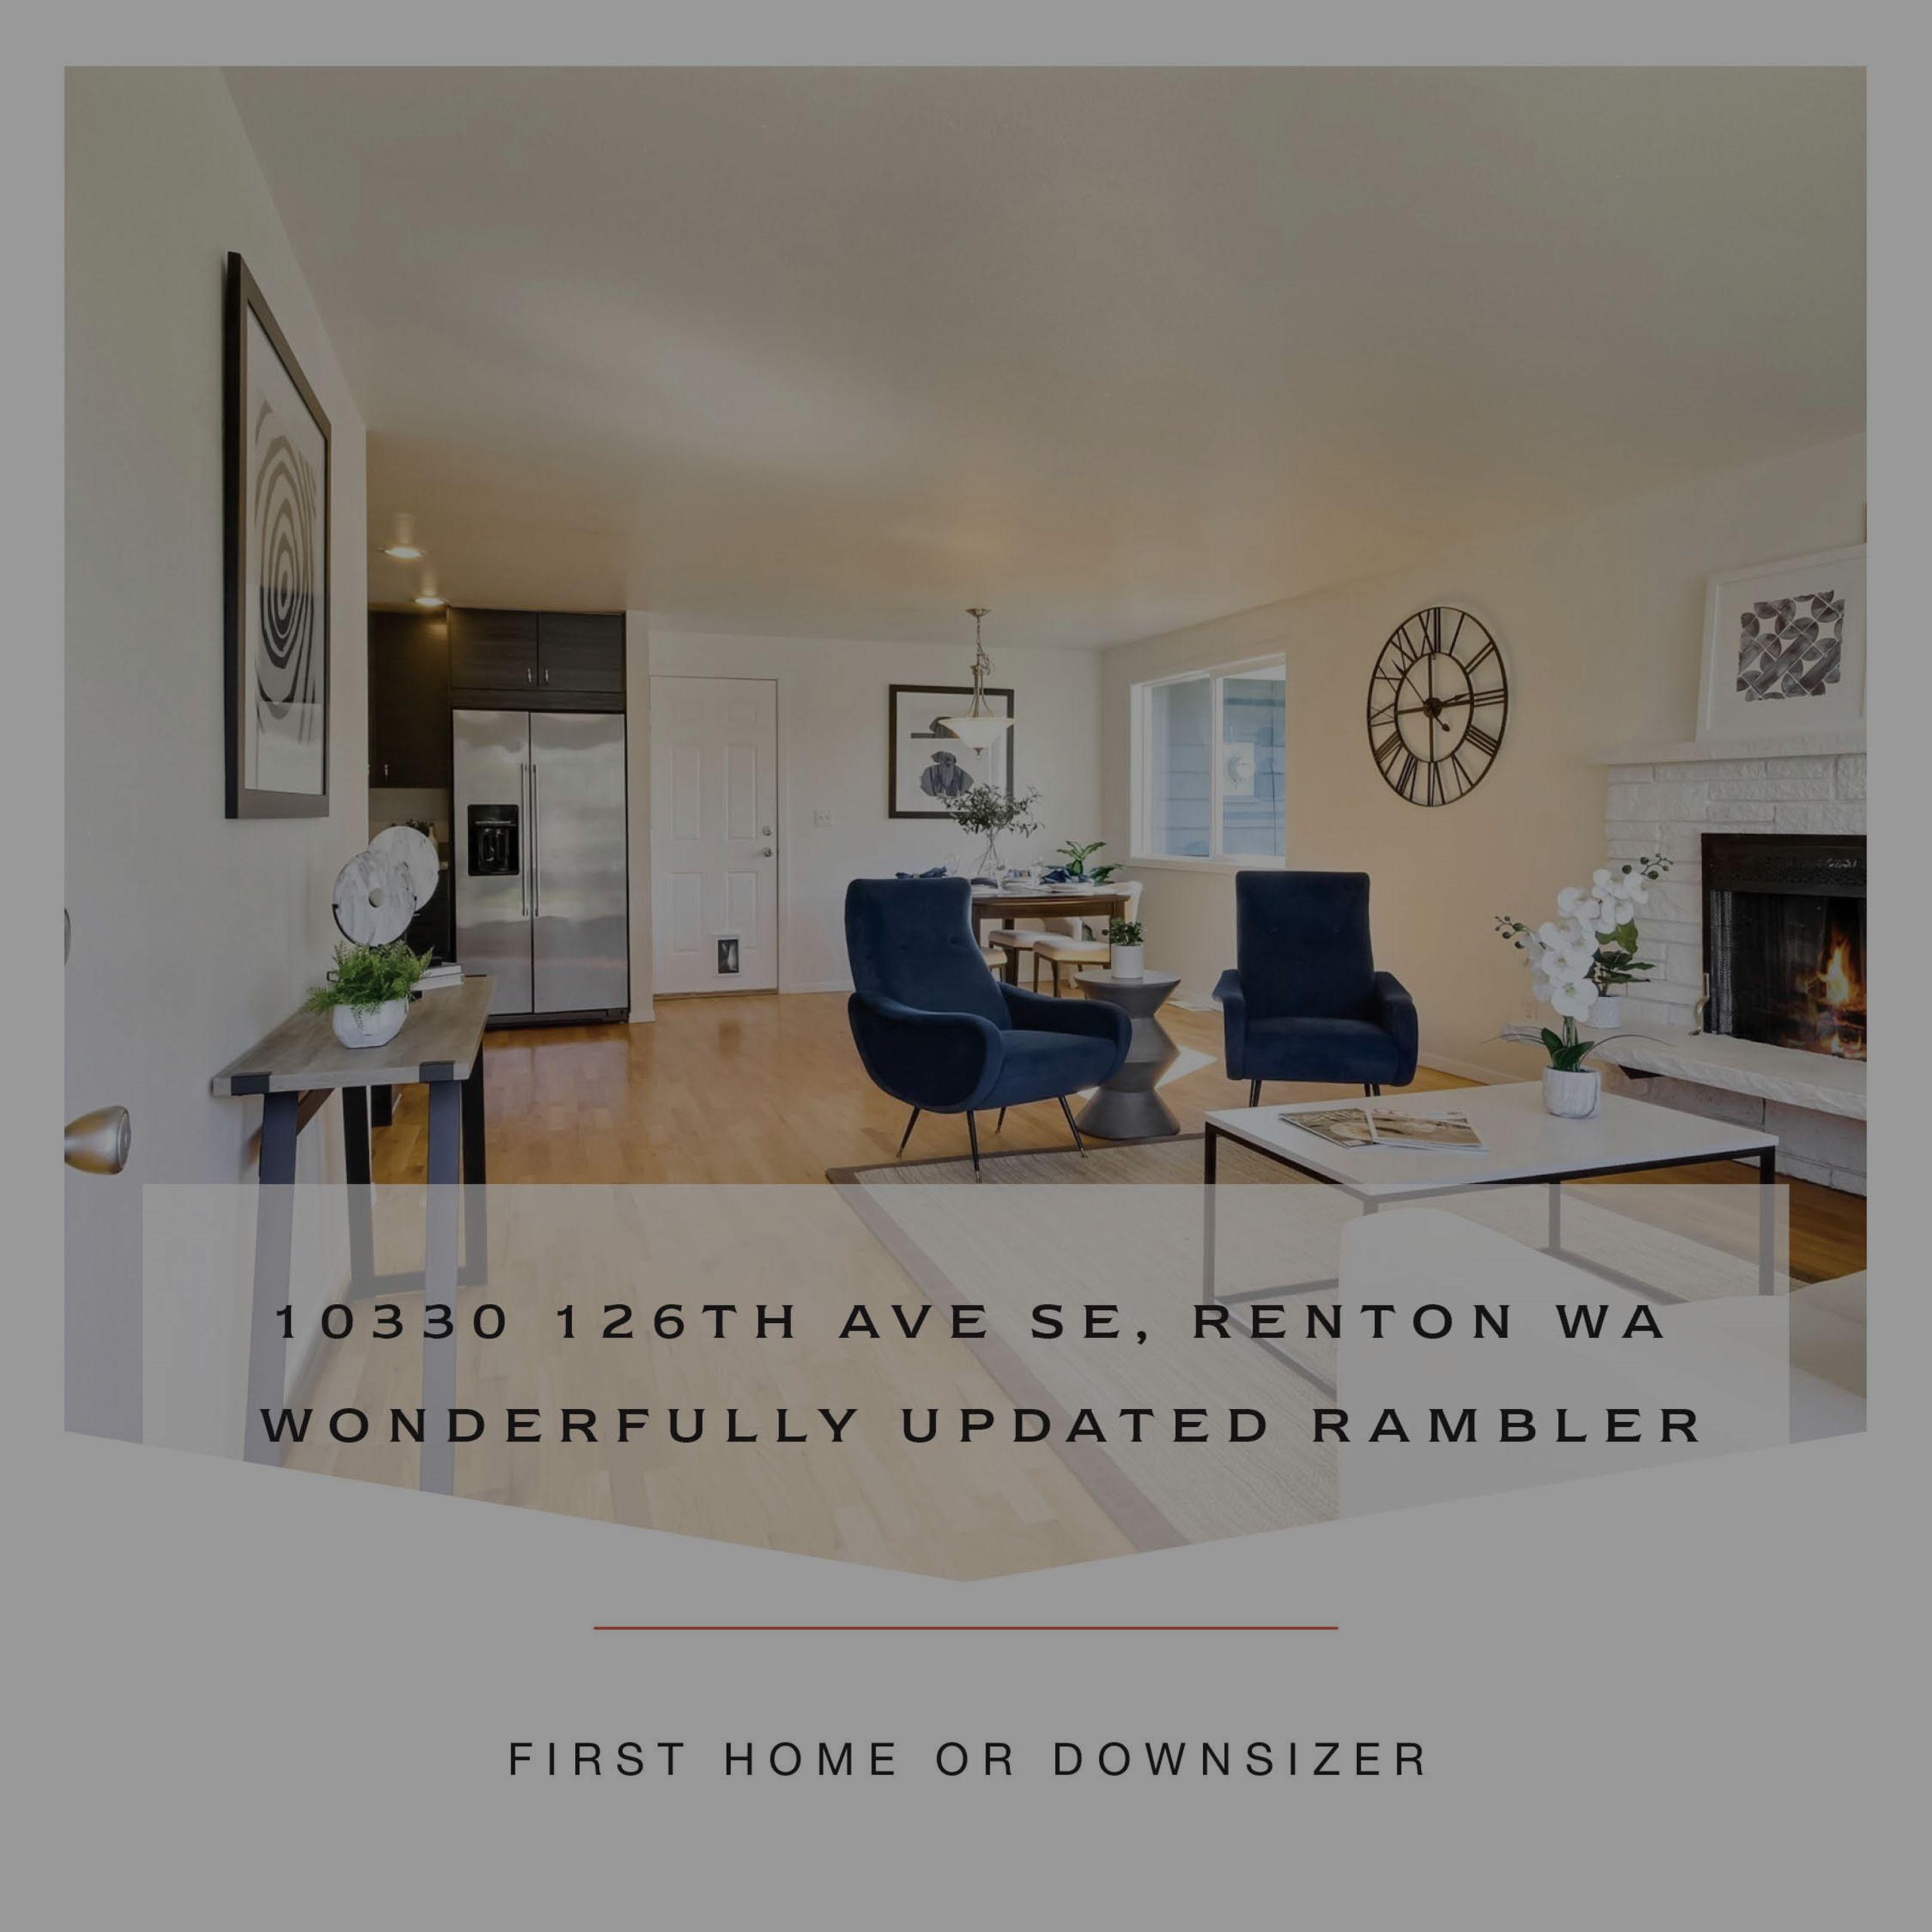 Rare Renton Rambler with Huge Yard